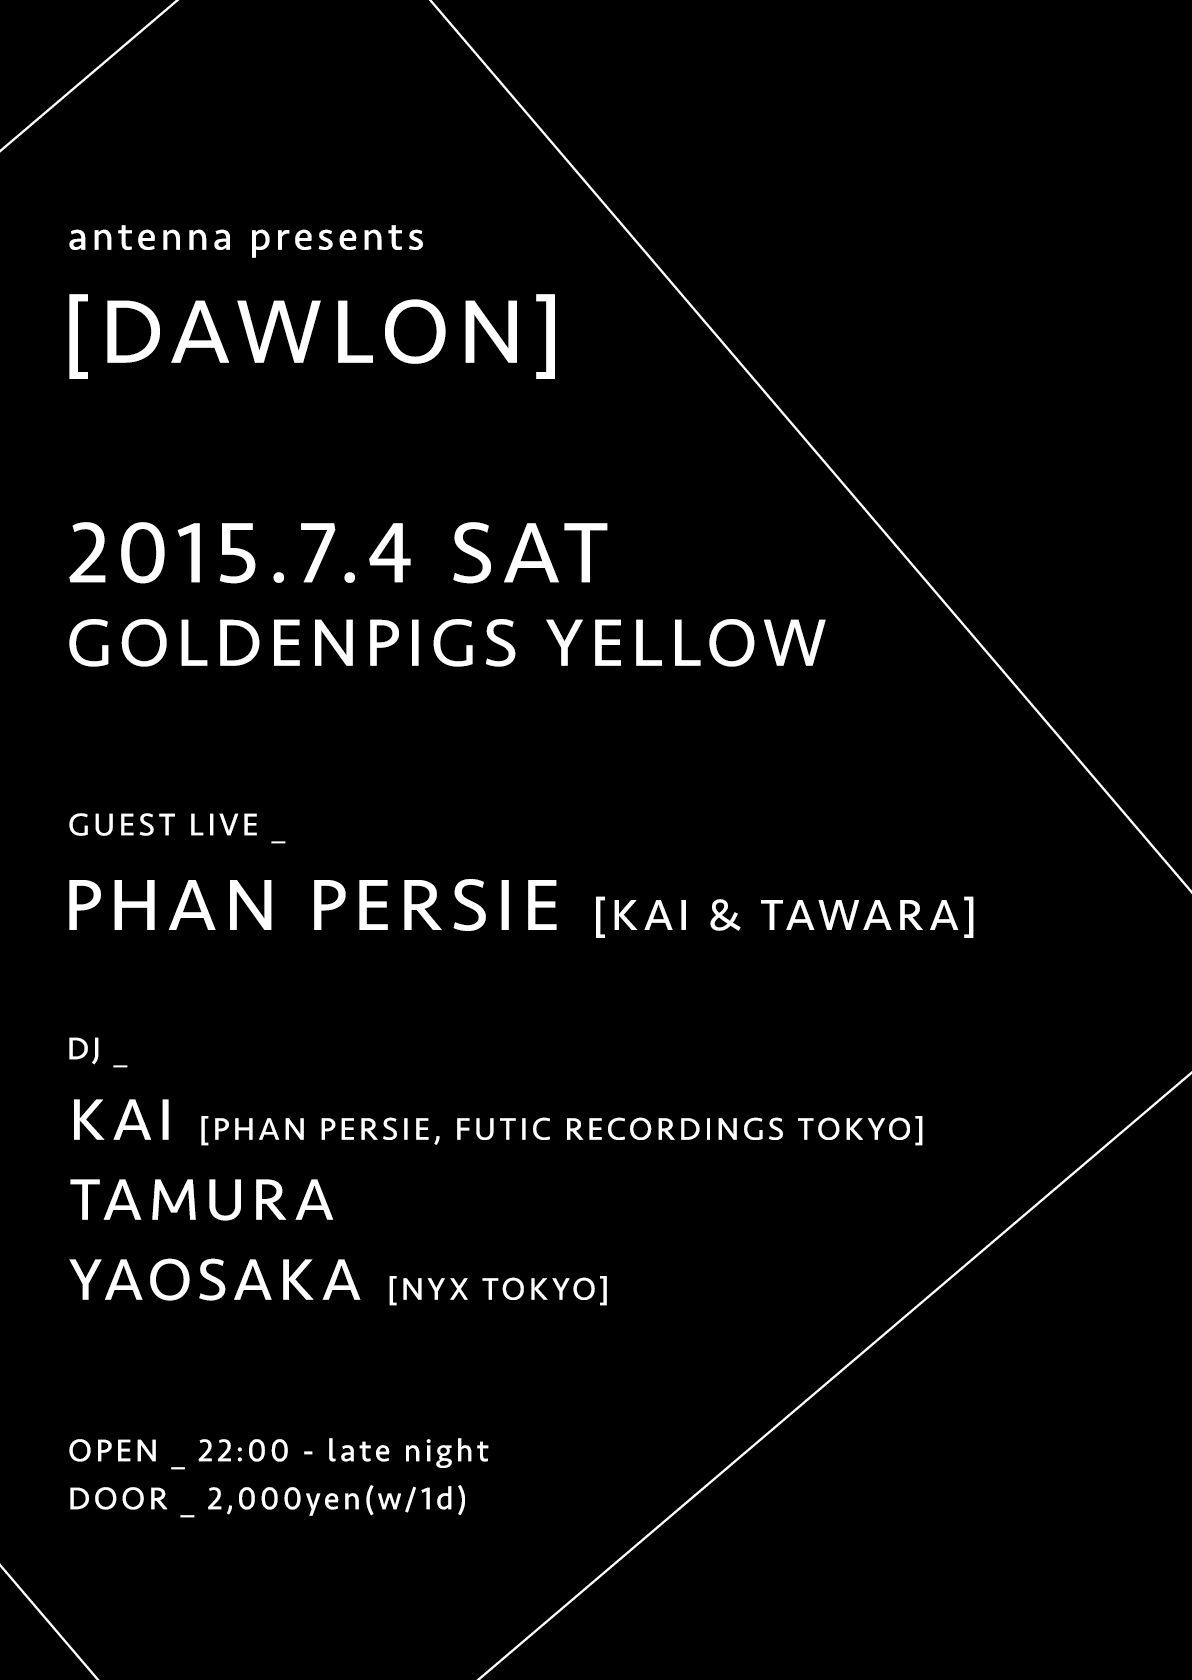 2015.7.4 SAT – PHAN PERSIE : LIVE, KAI : DJ@GOLDENPIGS / DAWLON